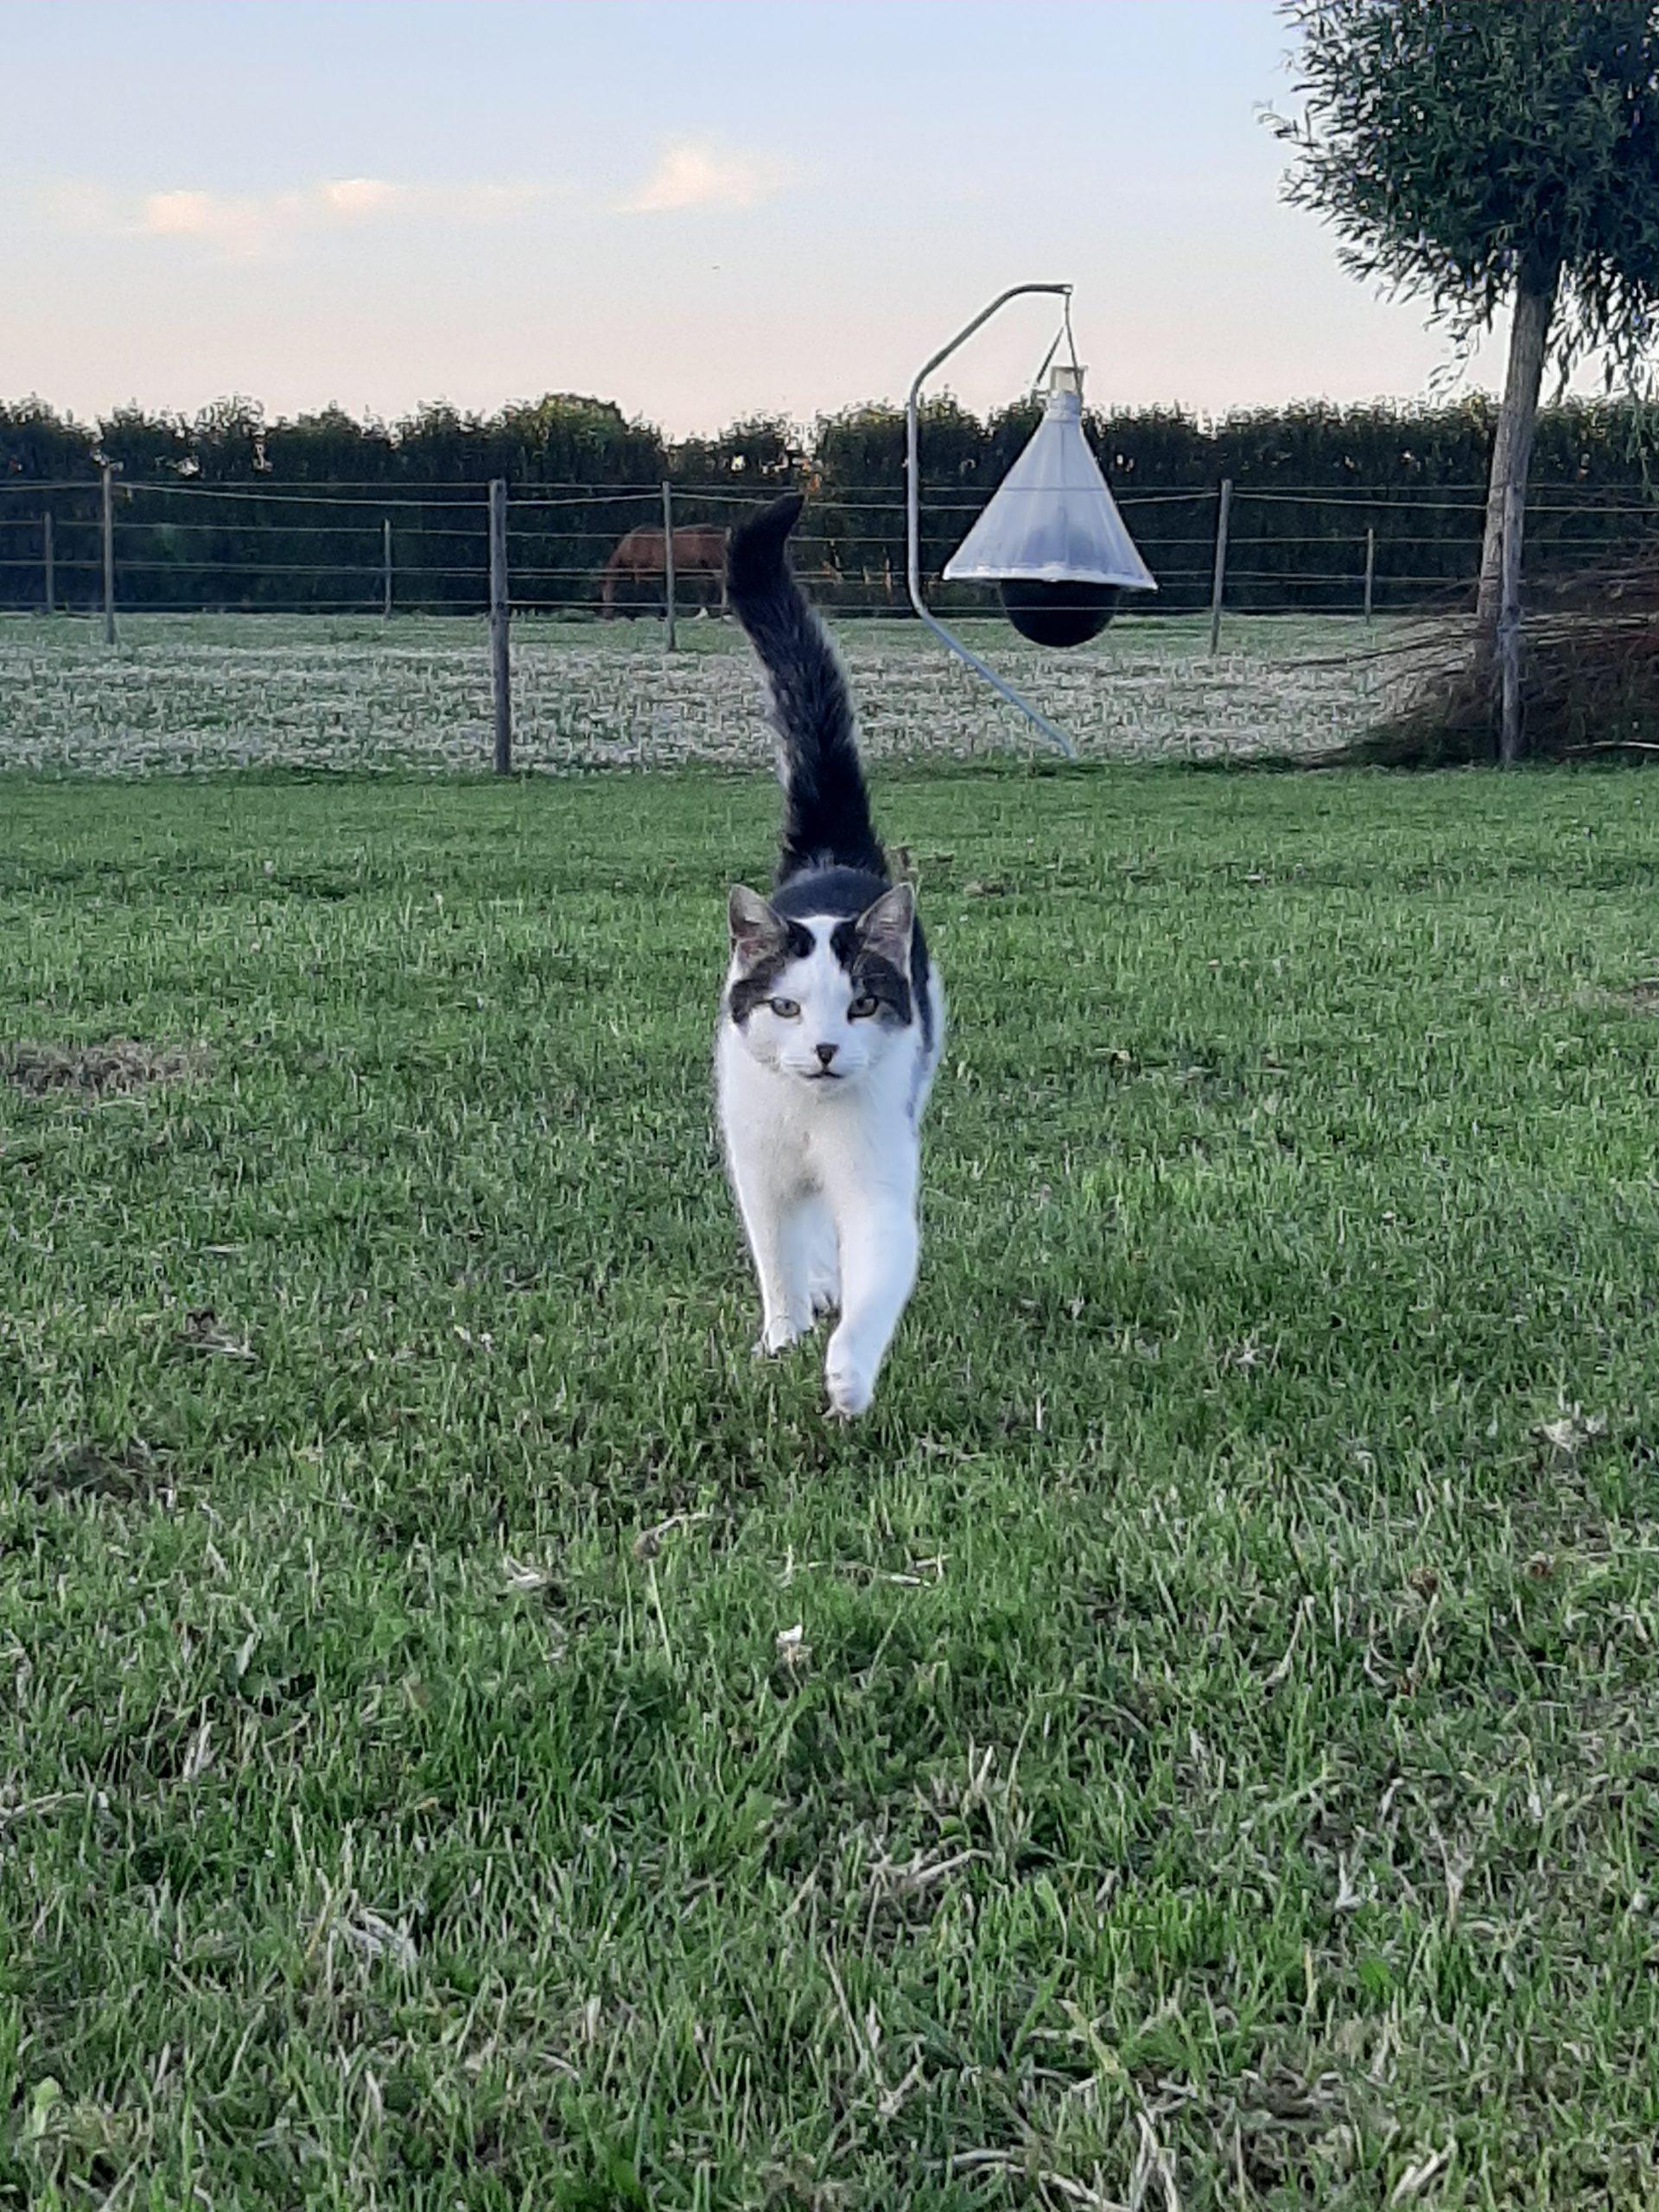 Stal-Schouten-Kat-Paarden-dieren